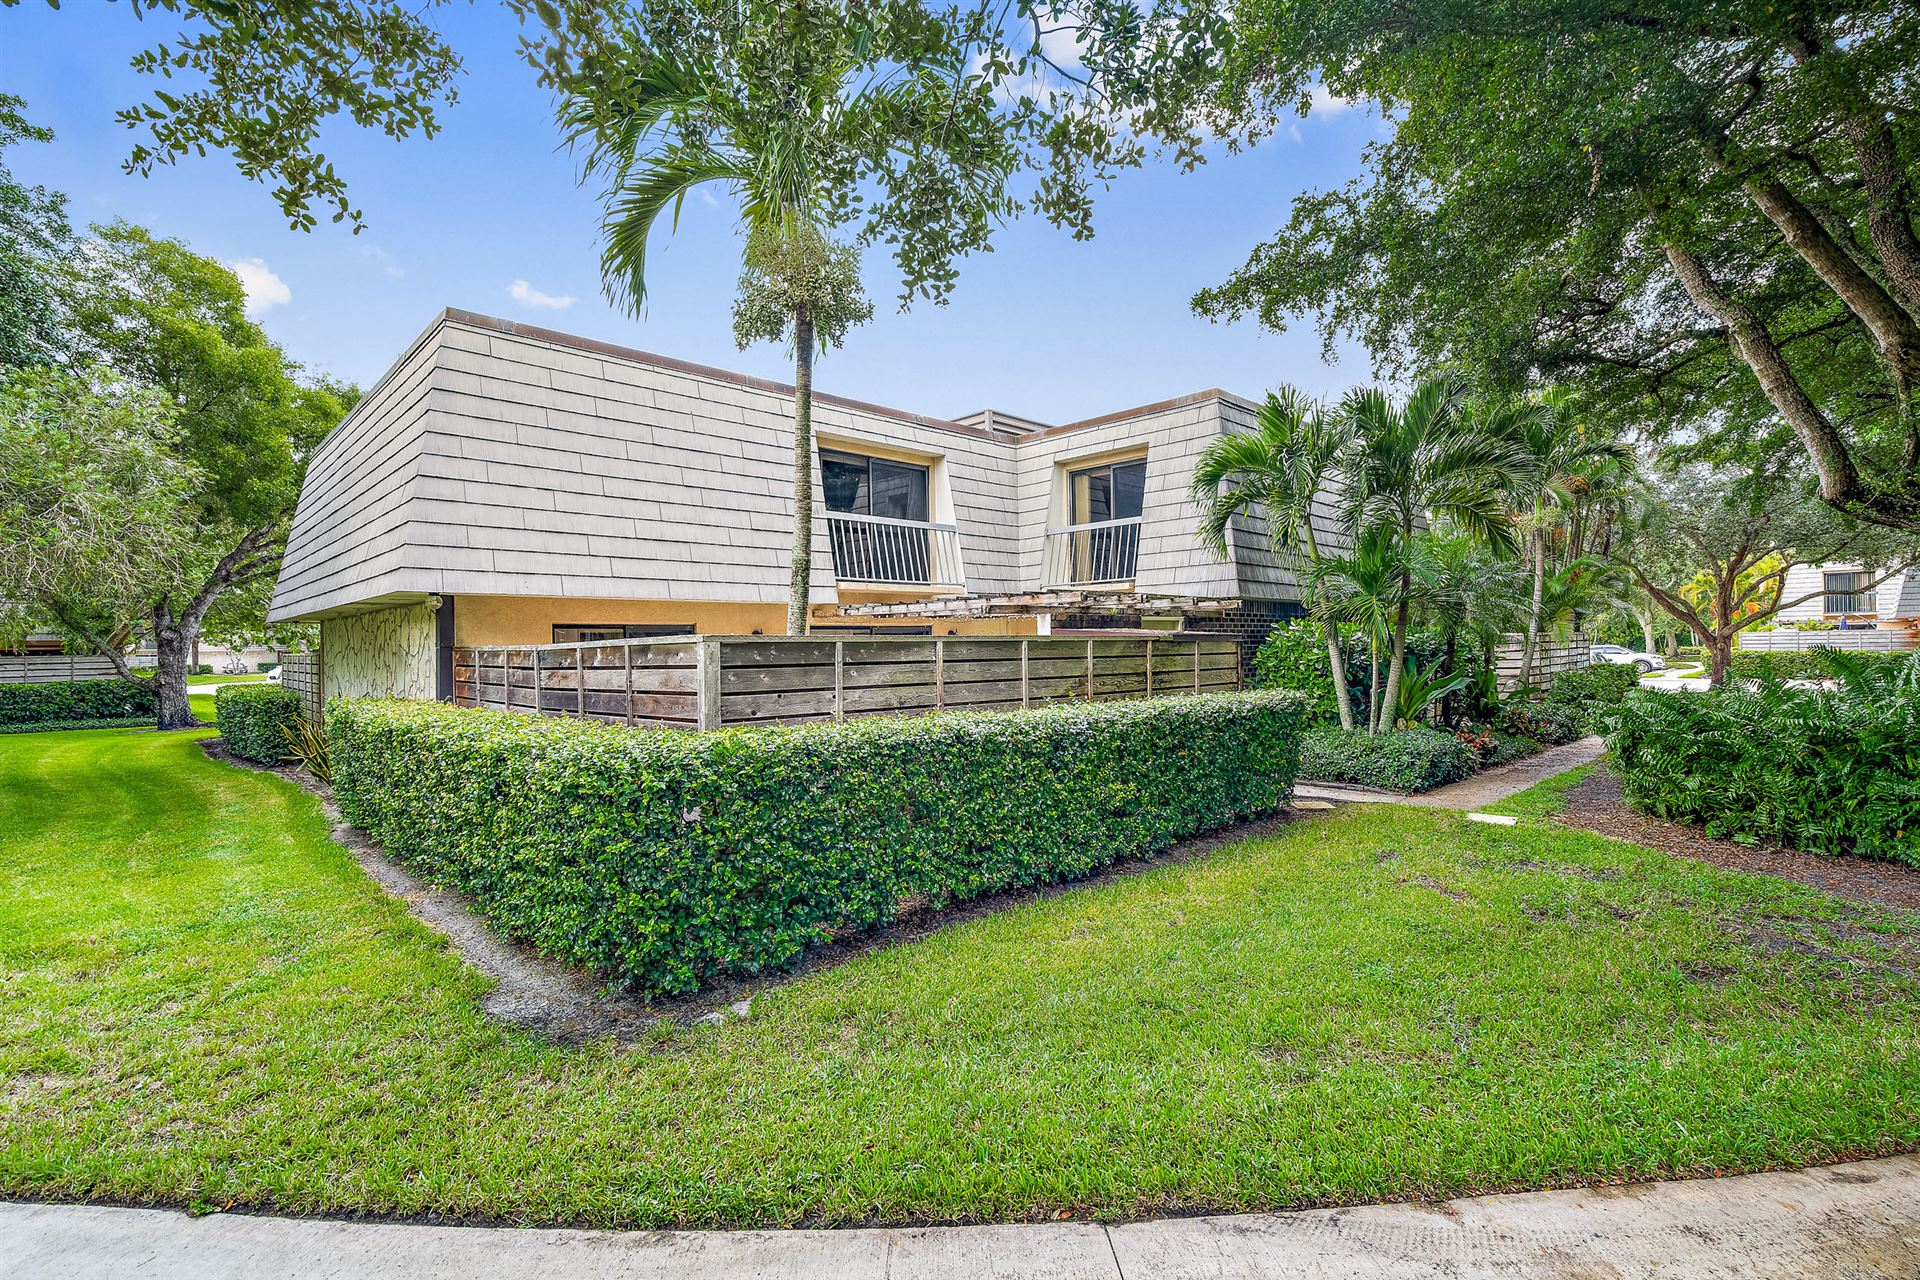 Photo of 1202 12th Terrace, Palm Beach Gardens, FL 33418 (MLS # RX-10649292)